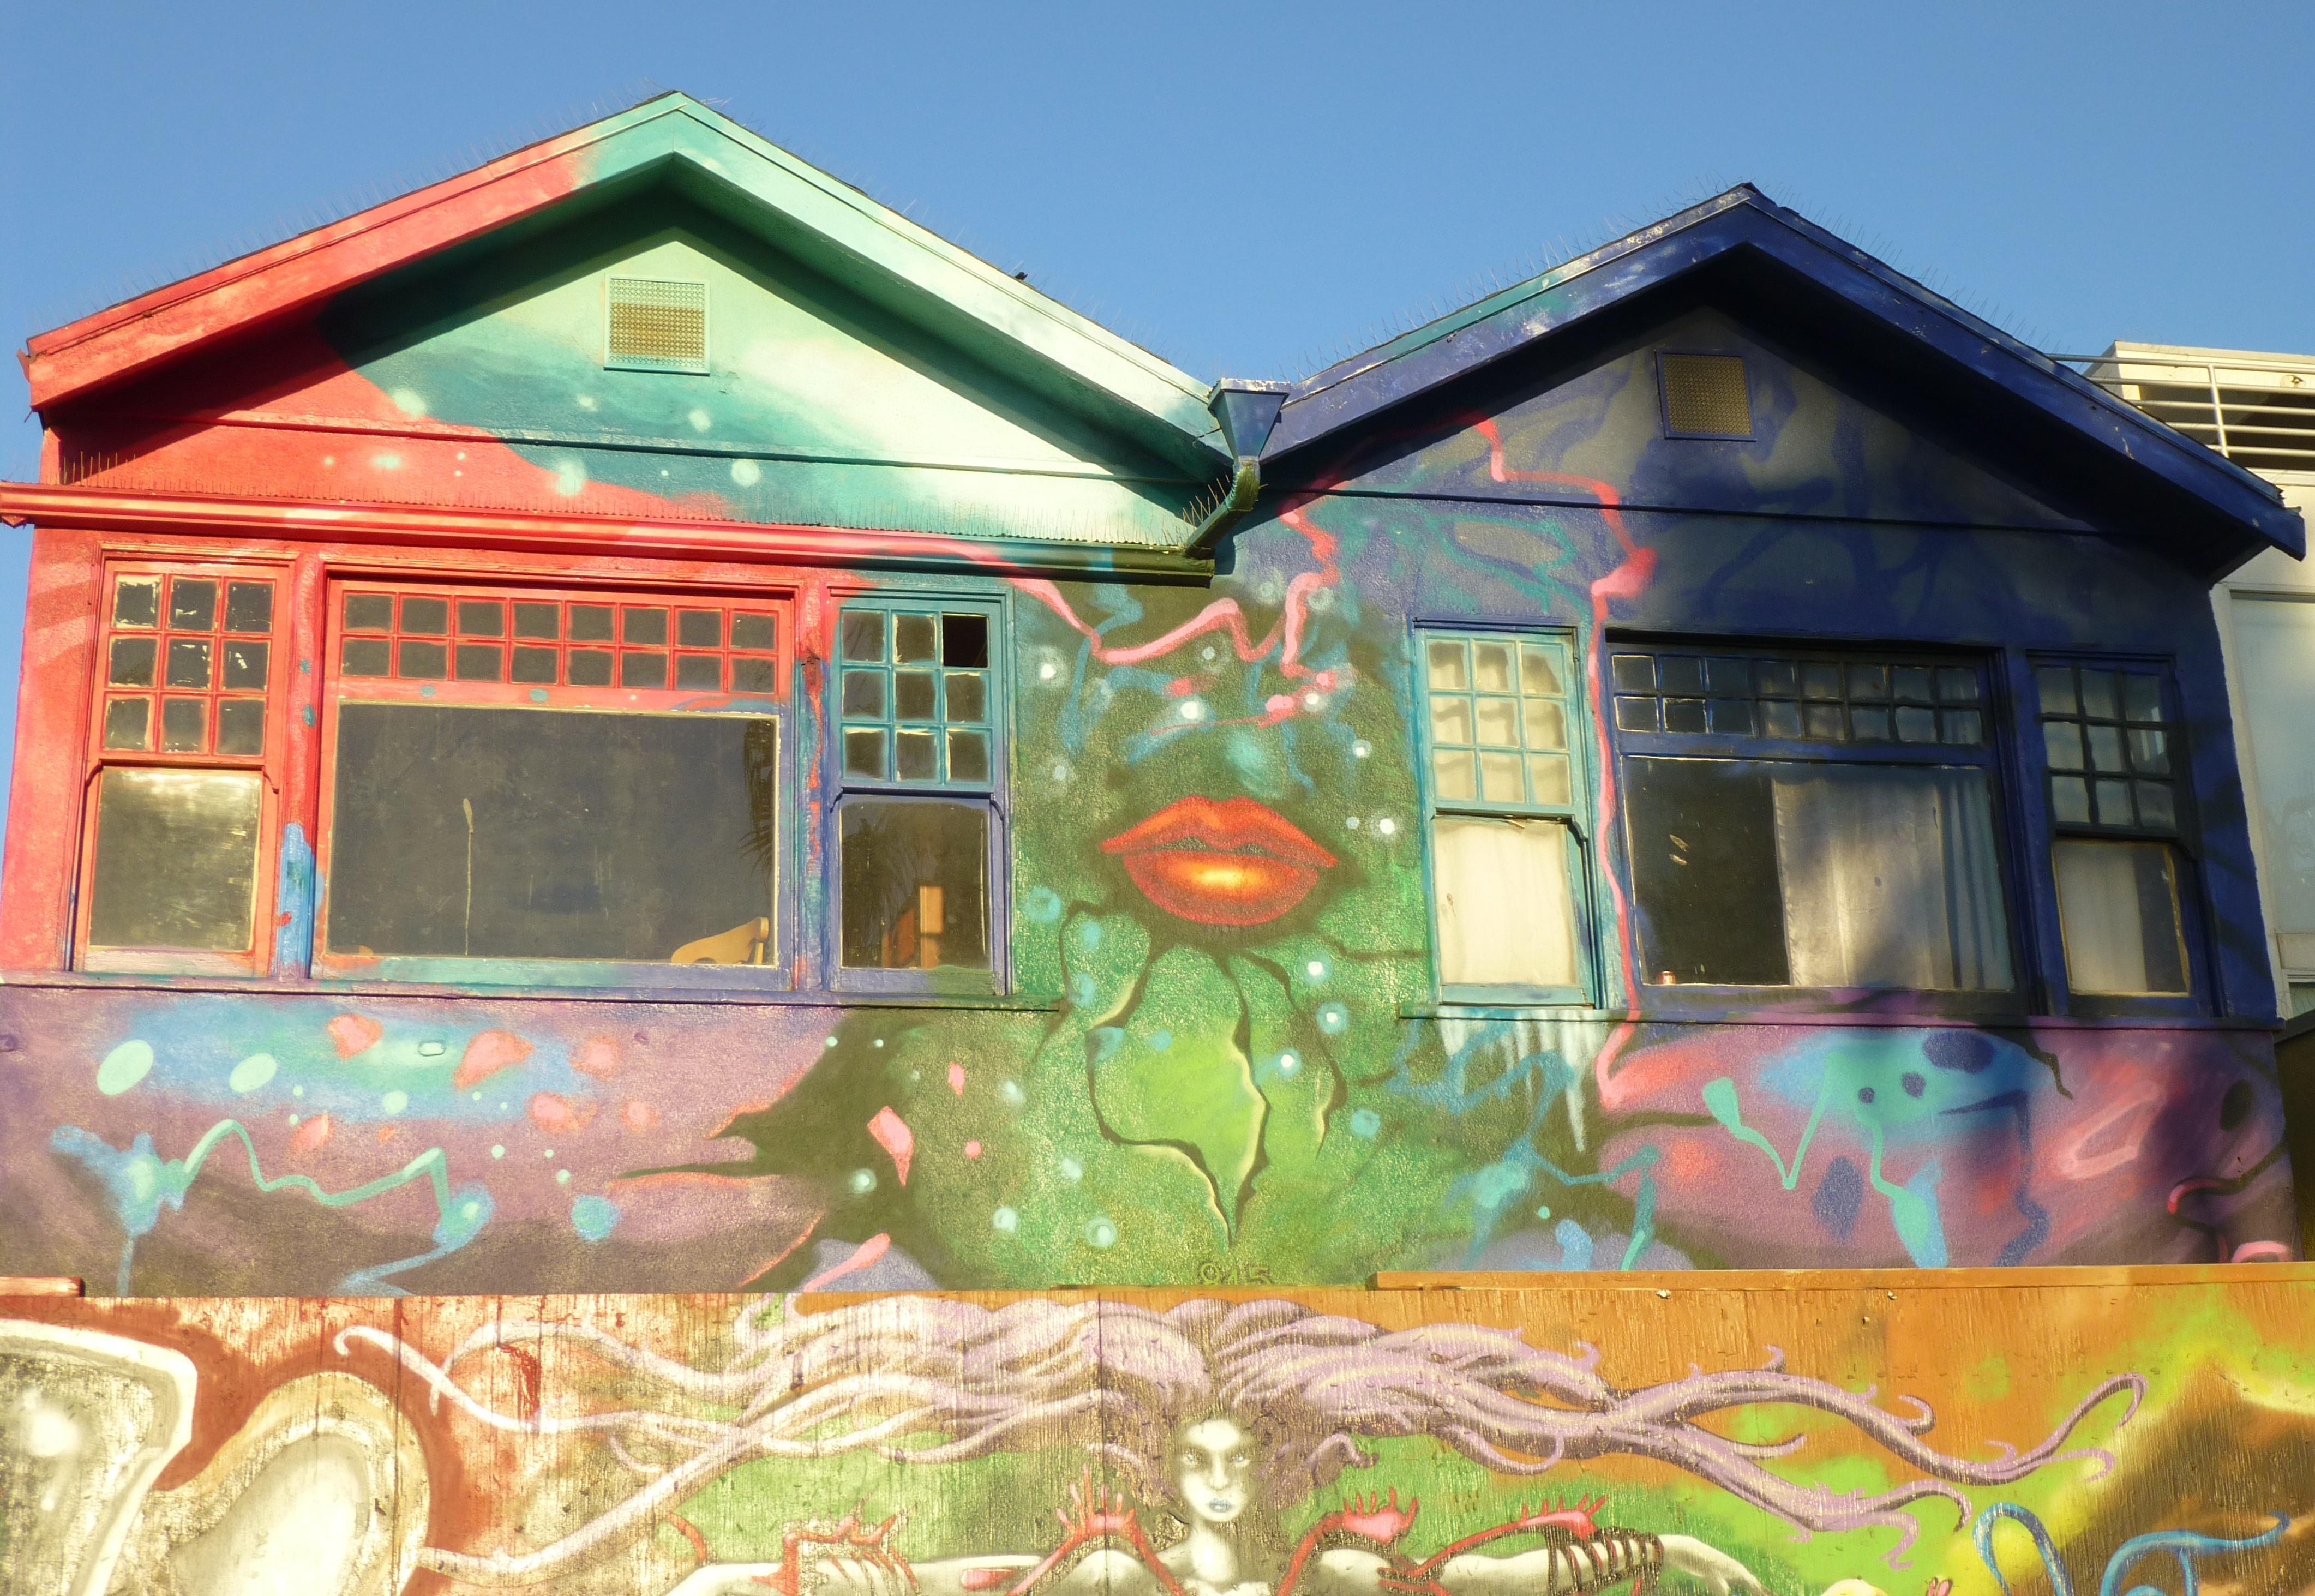 Graffiti House, Venice Beach, California | The Worley Gig